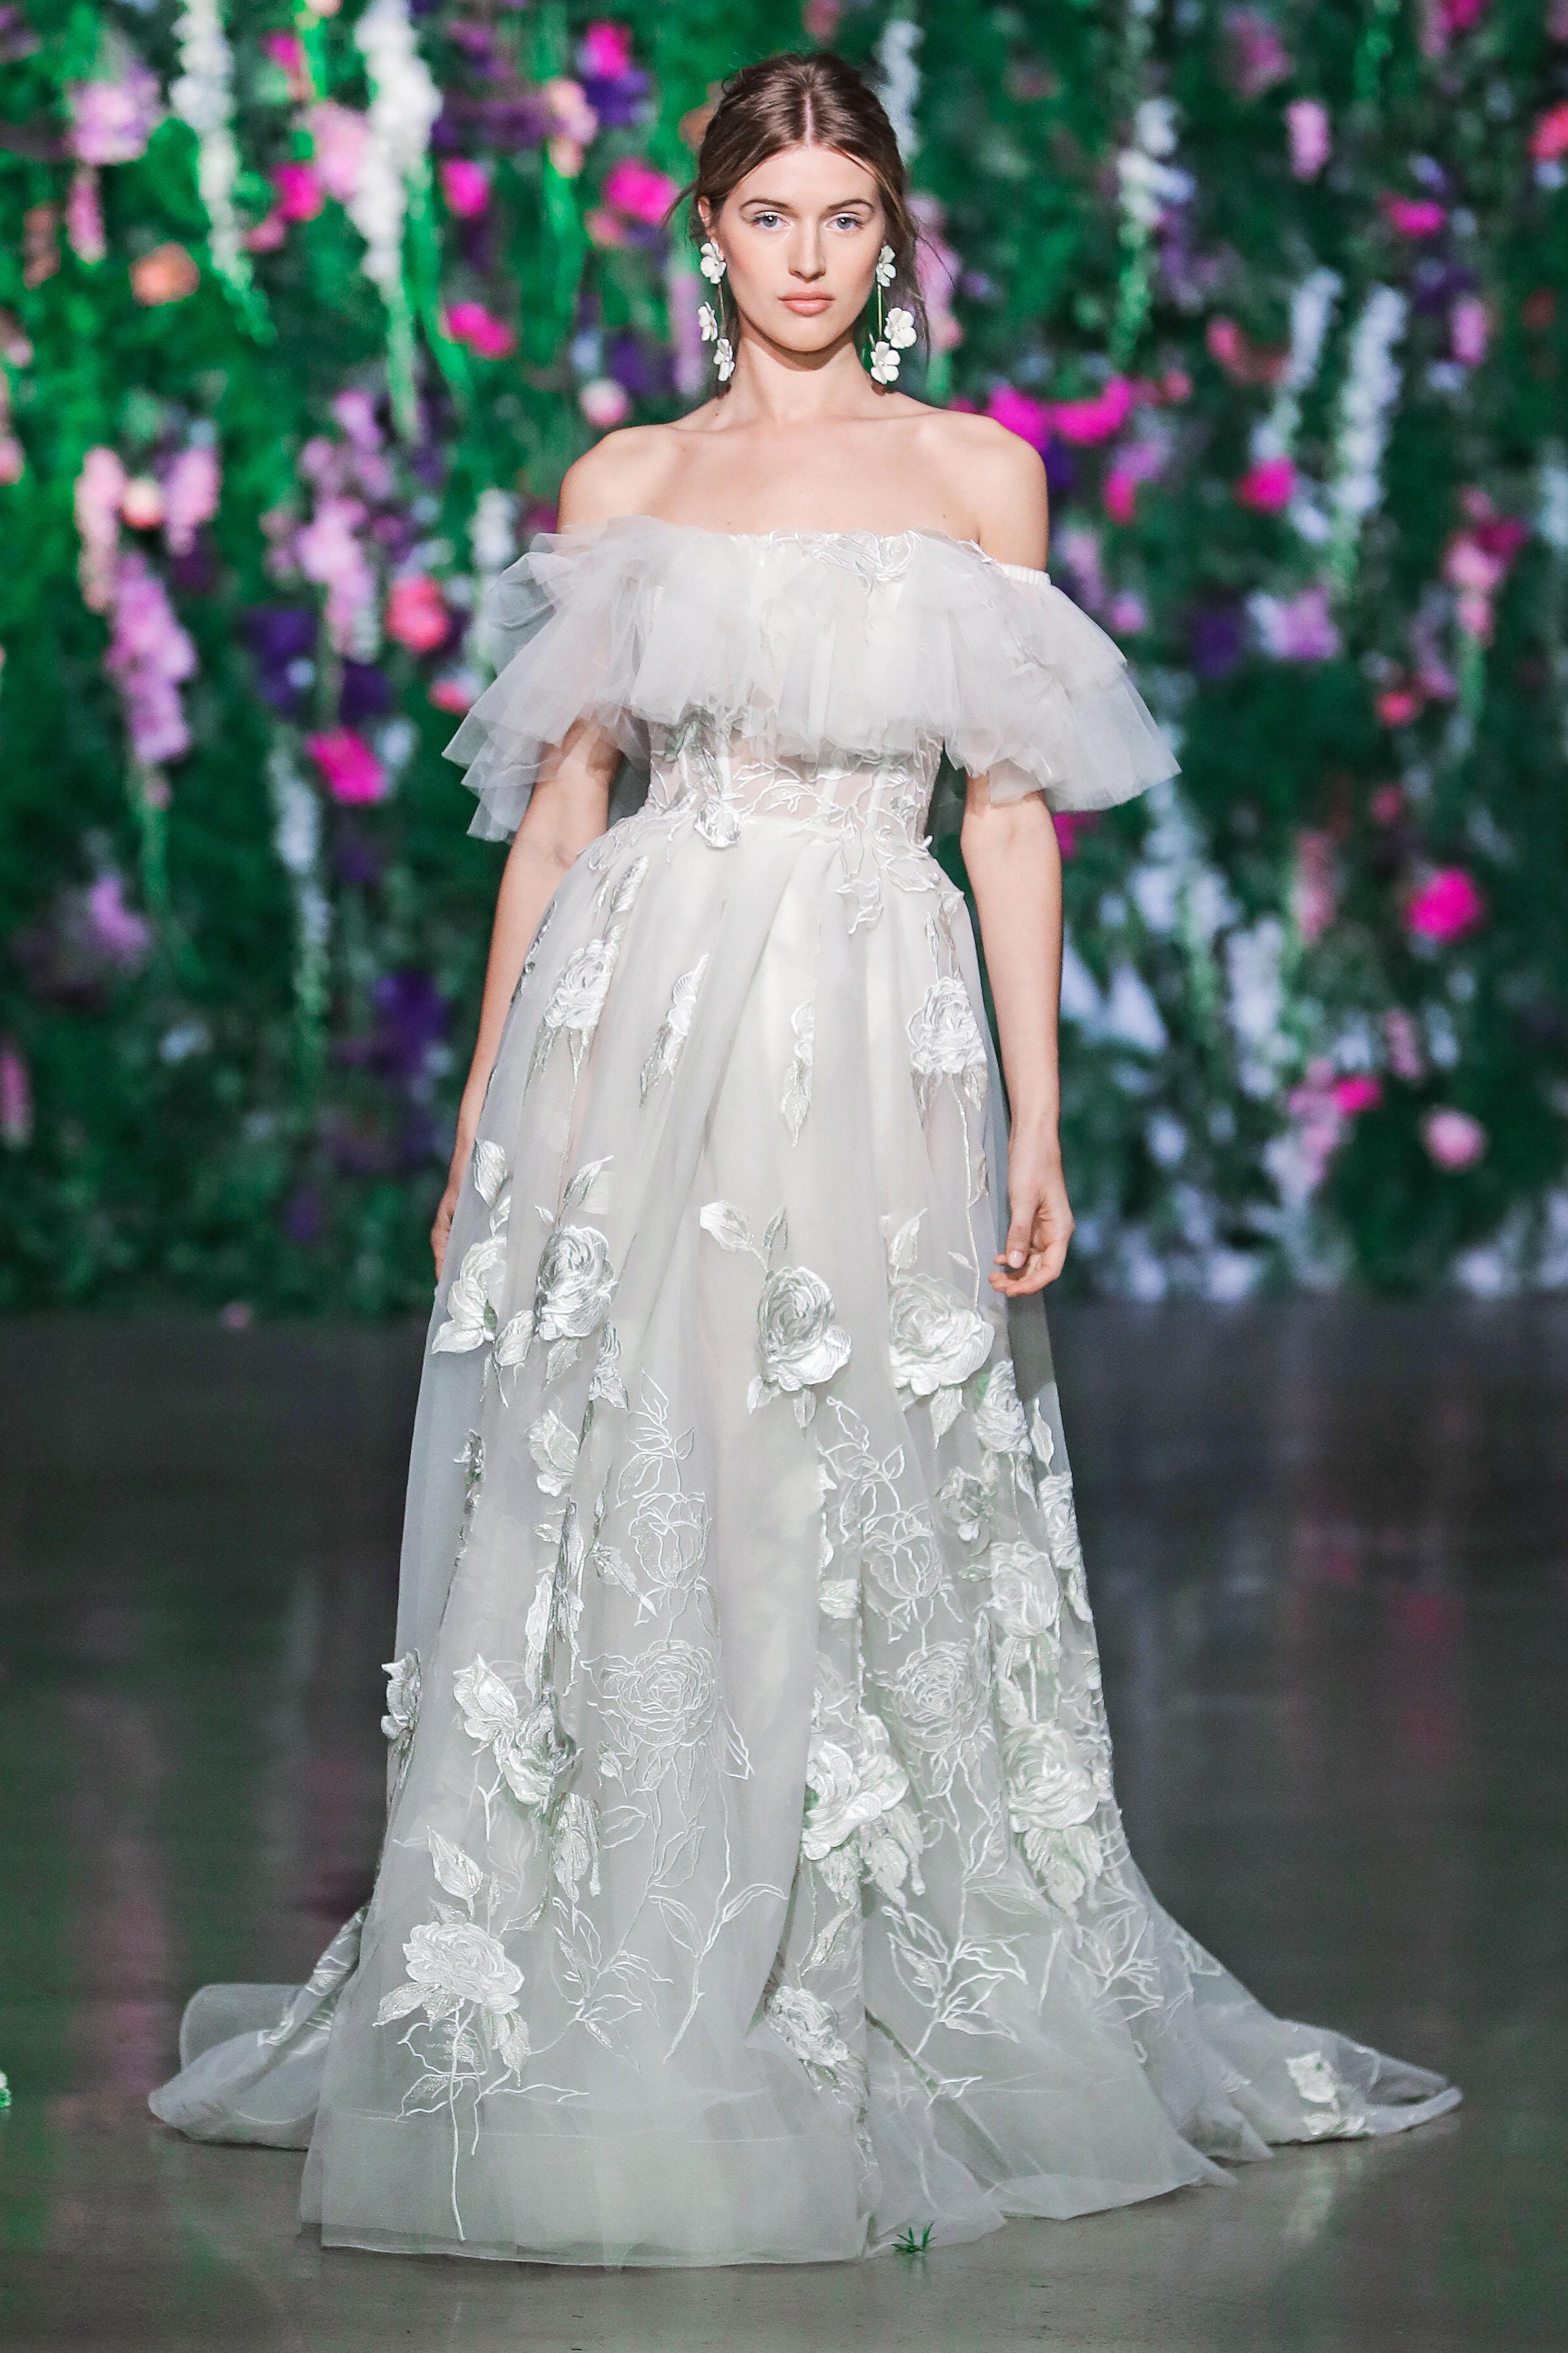 Galia Lahav Floral Off-the-Shoulder Ball Gown Wedding Dress Fall 2018